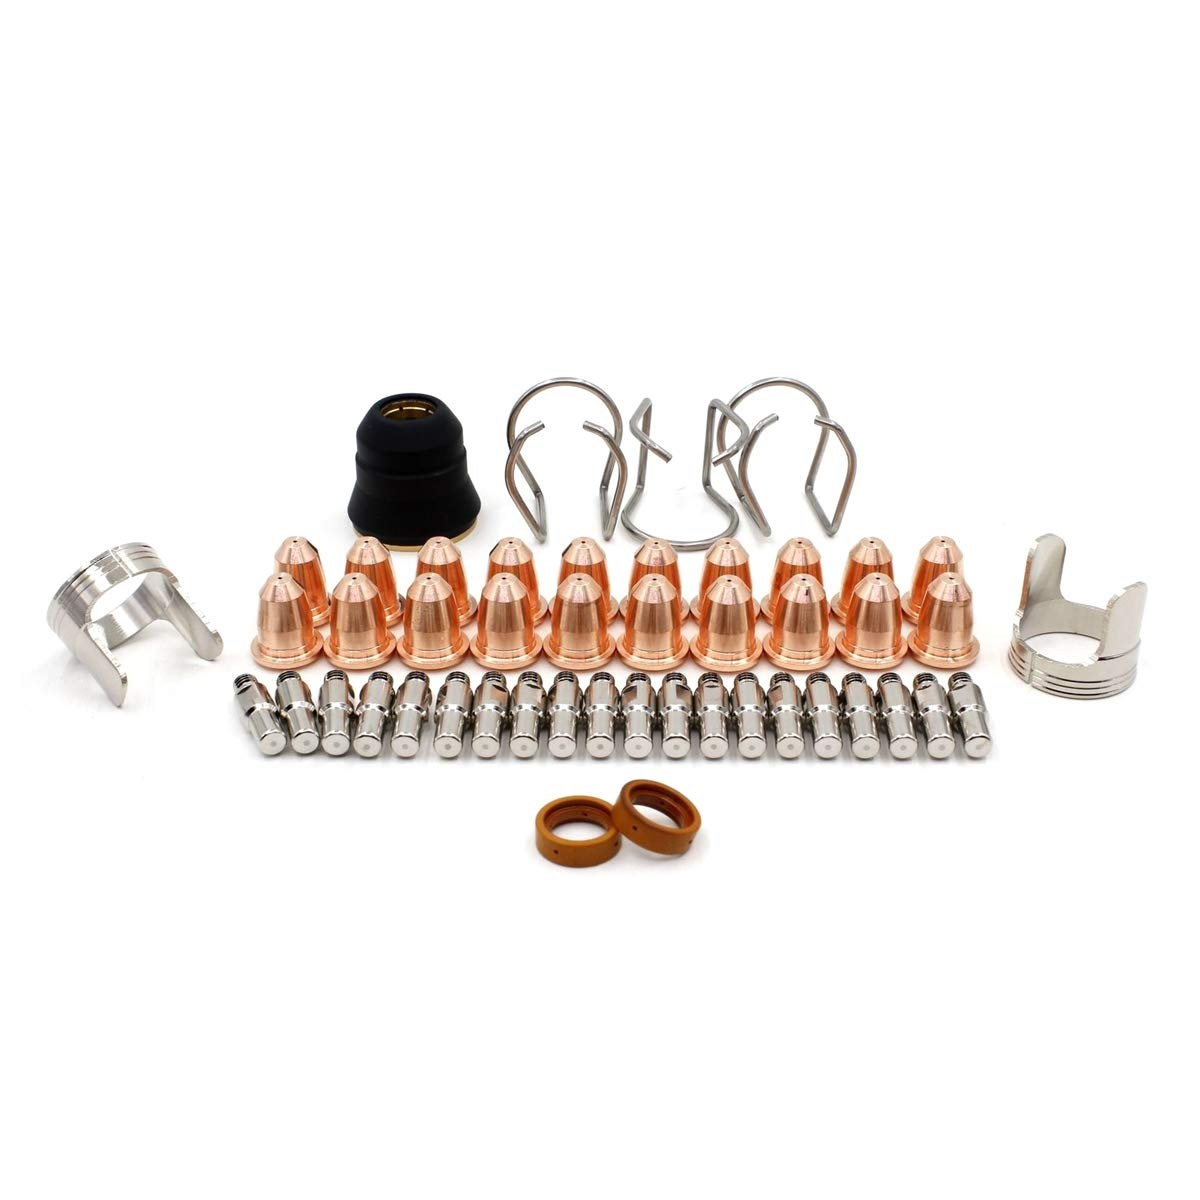 Plasma Electrode Tips 0.8mm 0.031'' for Razorweld TRF45-6-CC1 (Ref. RWPR-0110 RWPD-0116-8 | PKG-48) Weldingstop